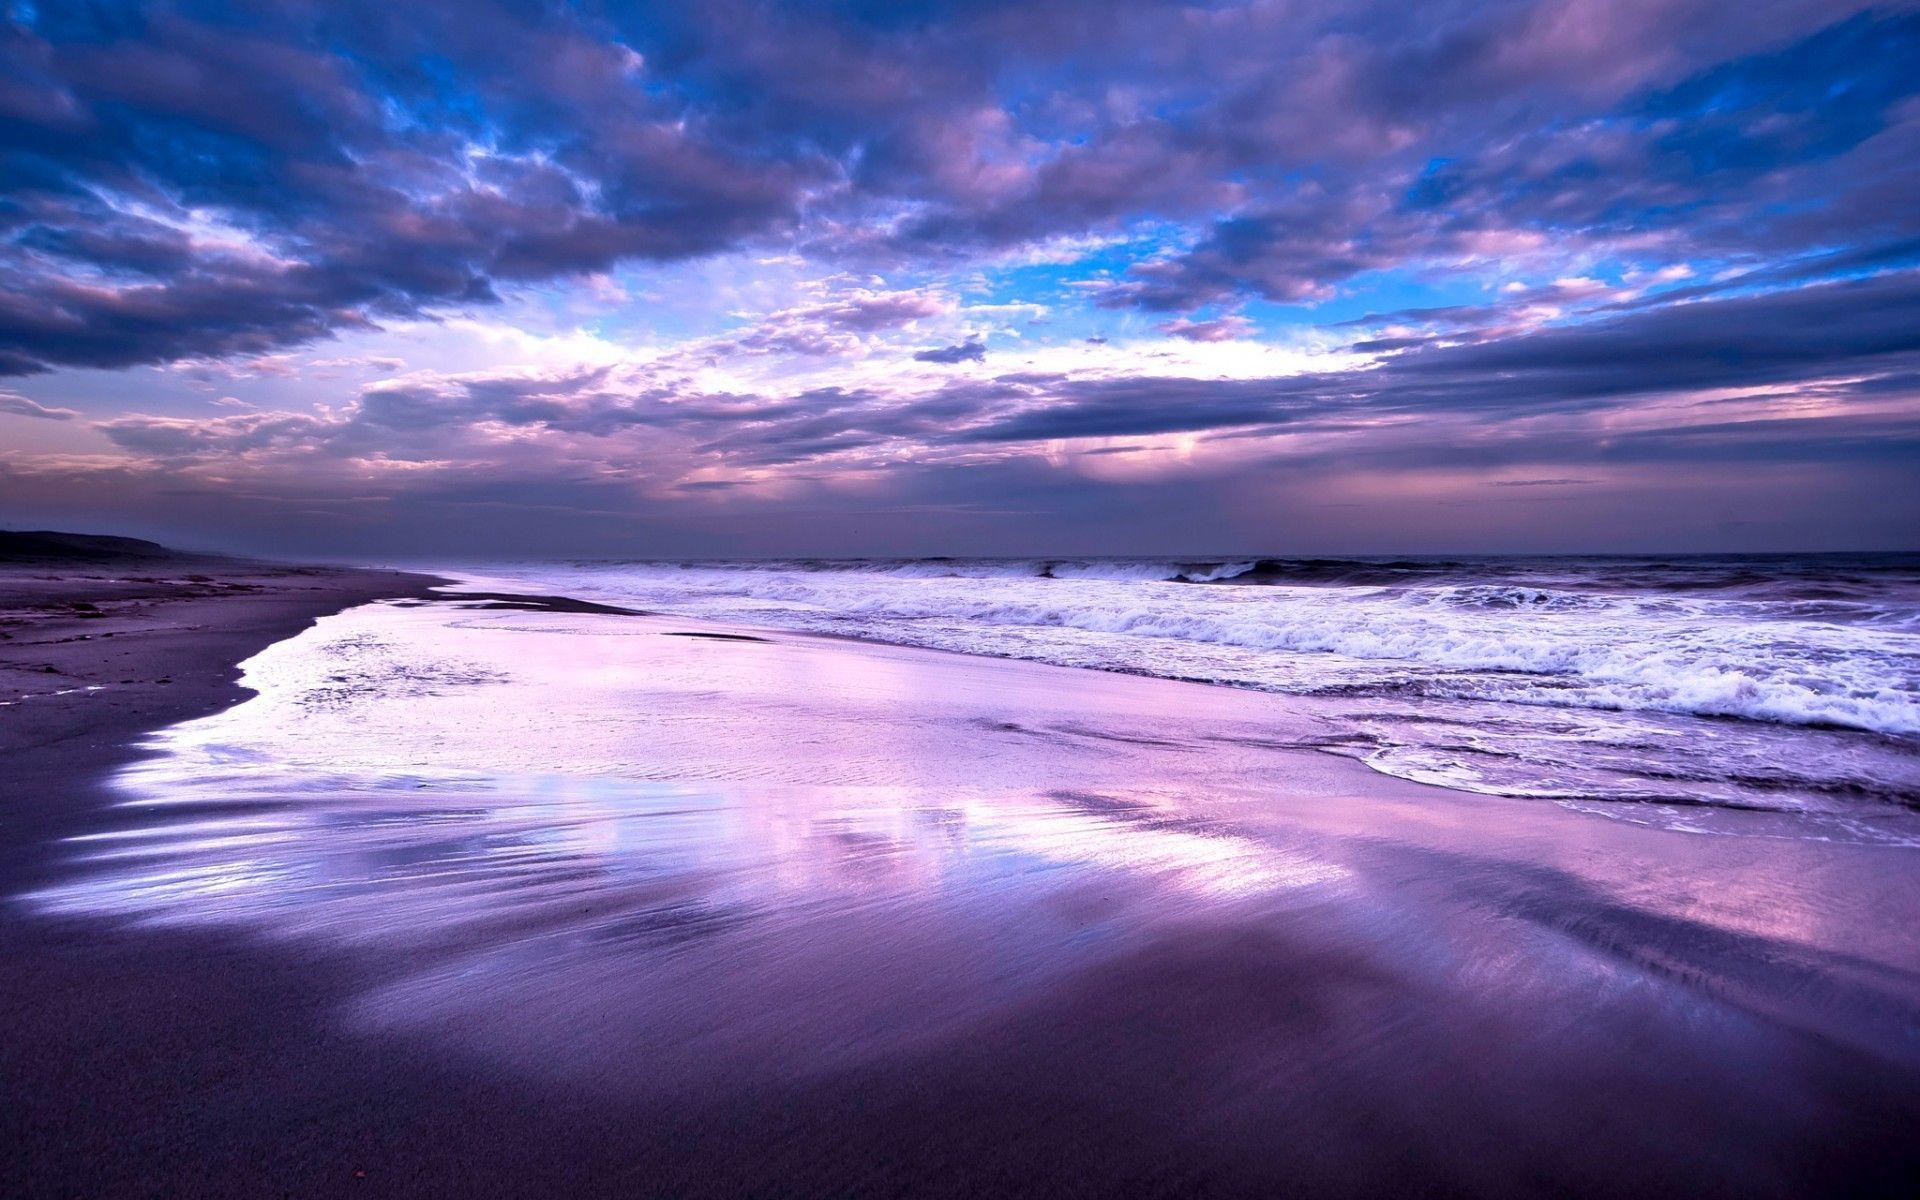 Purple Sunset At The Beach Wallpaper Purple Sunset